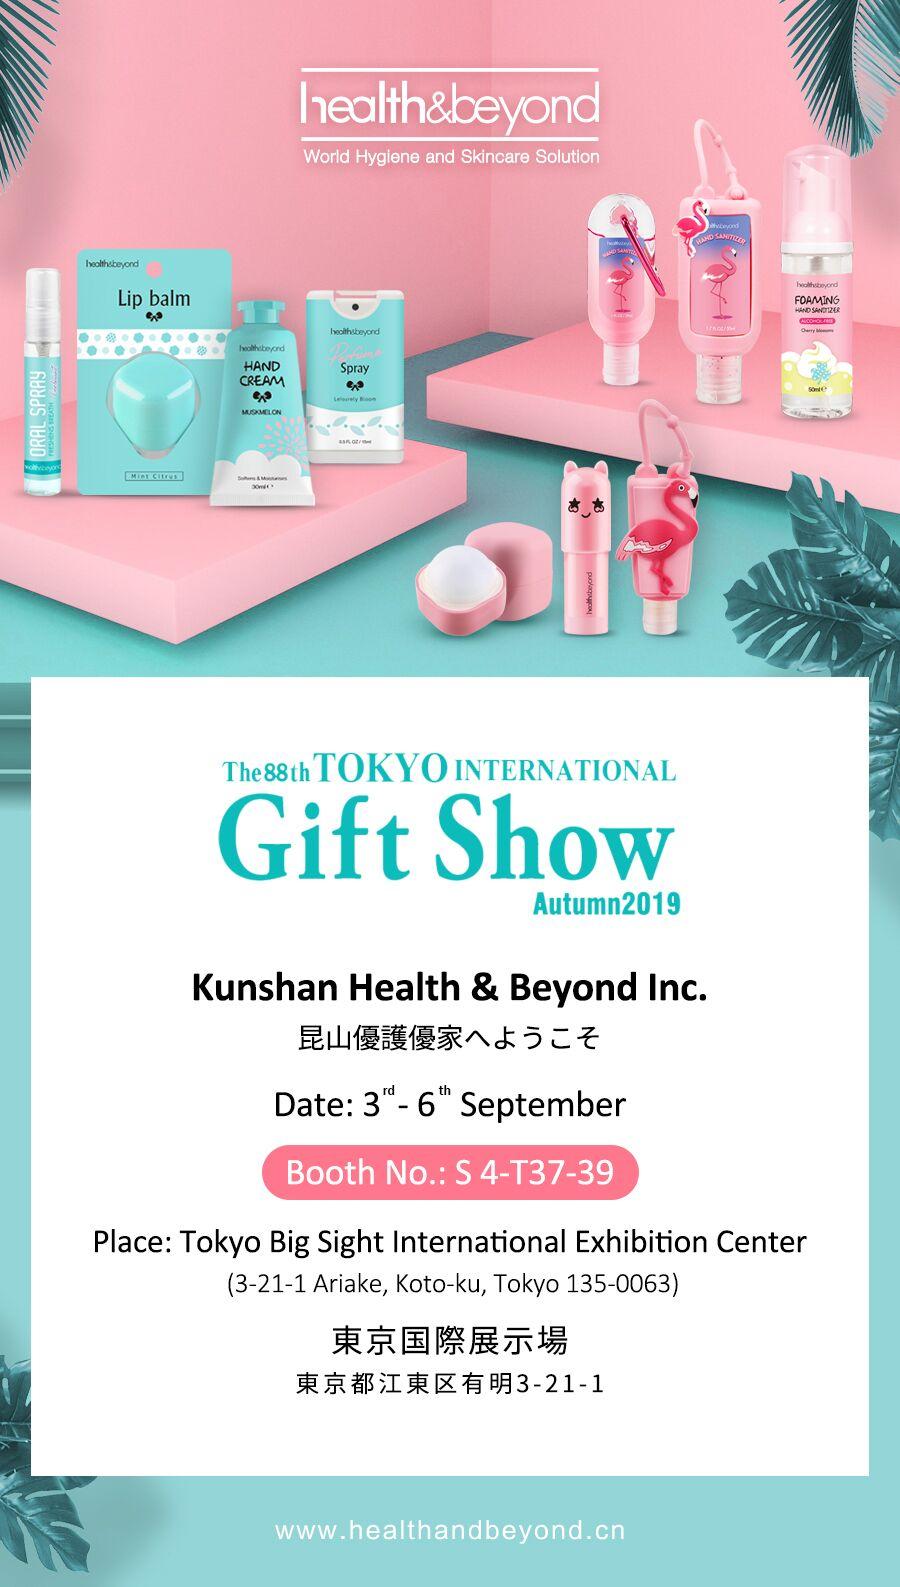 Invitation to Tokyo International Gift Show